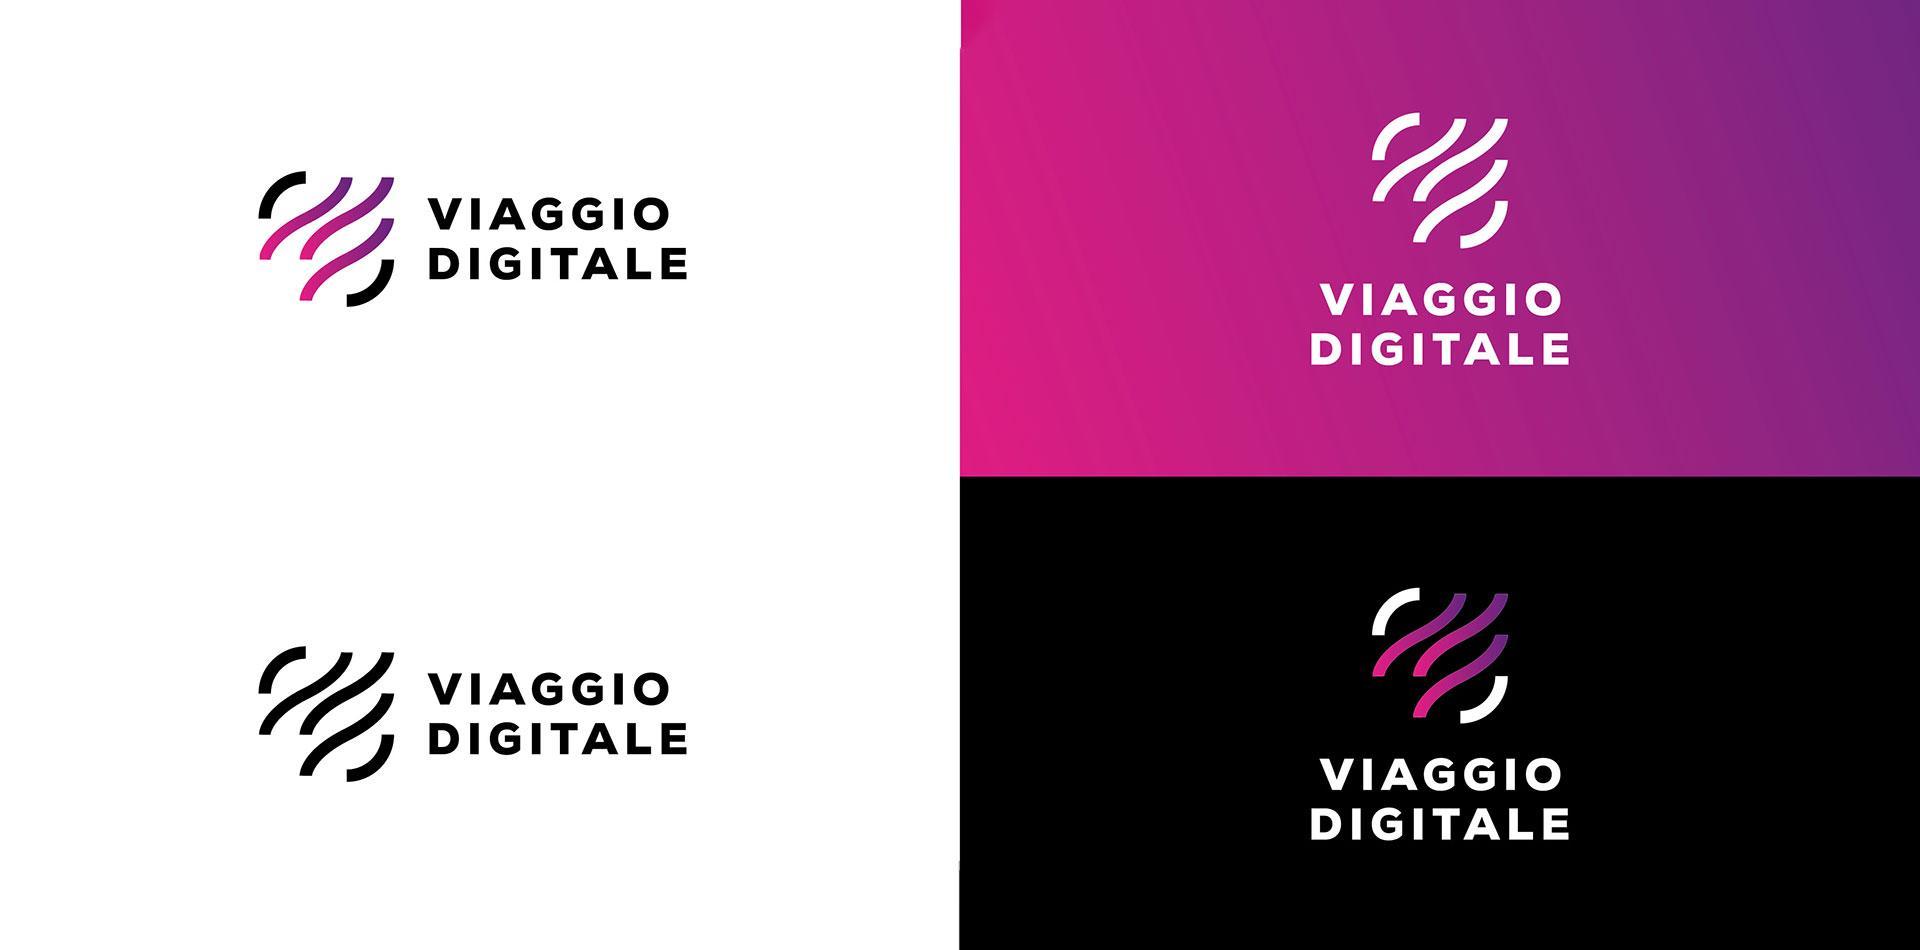 FEDERICO-REDOLFI_viaggio-digitale